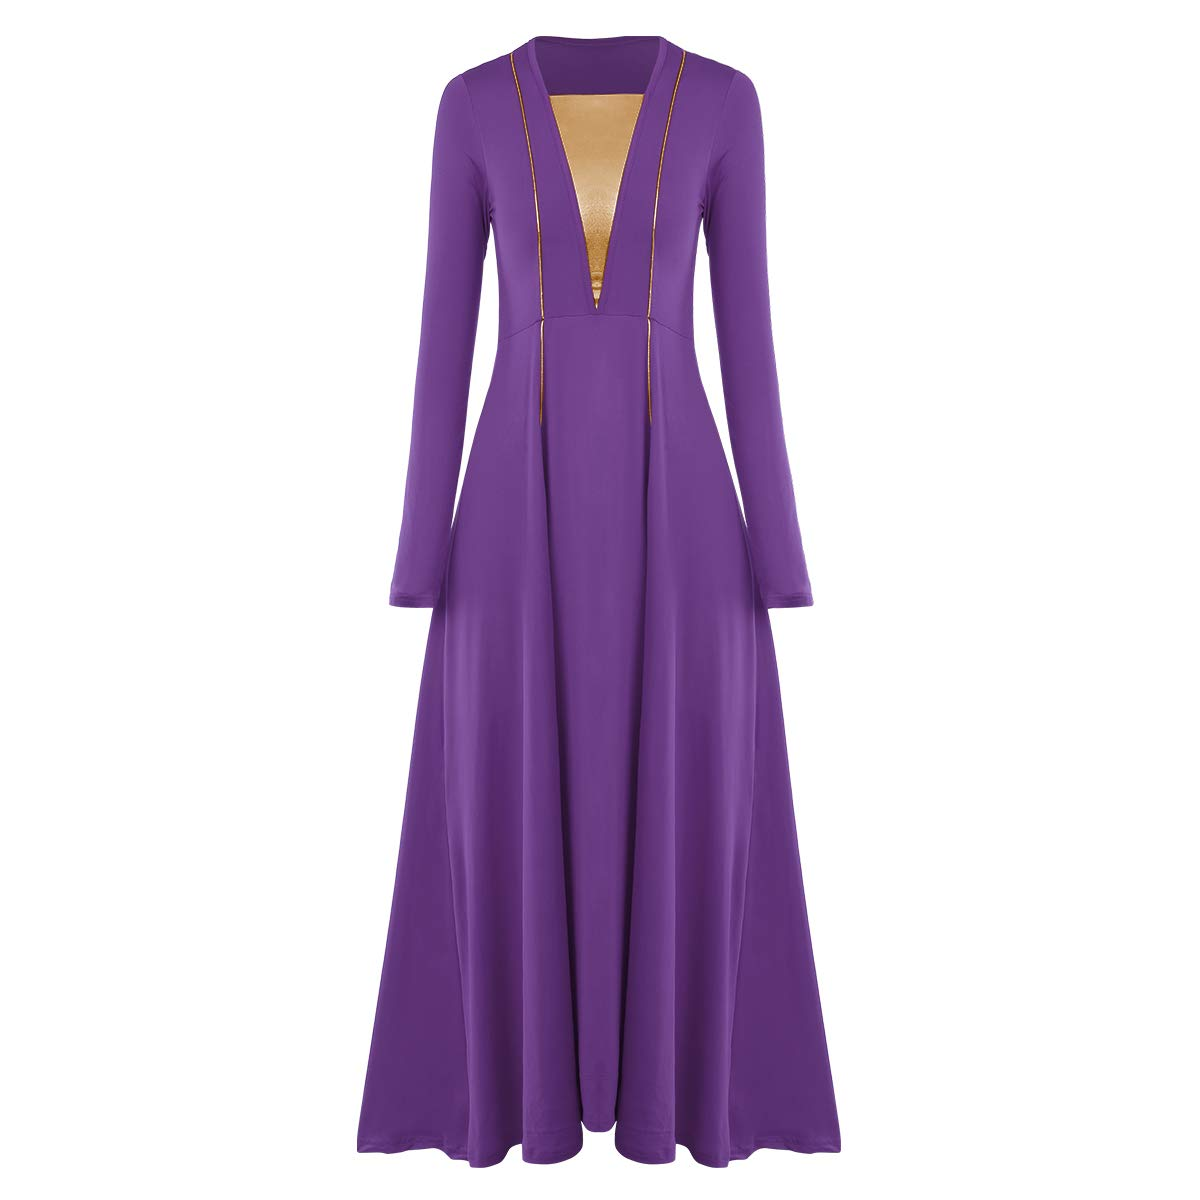 IBAKOM Womens Metallic V-Neck Long Sleeve Worship Praise Liturgical Full Dance Dress Metallic Gold Loose Fit Tunic Dancewear